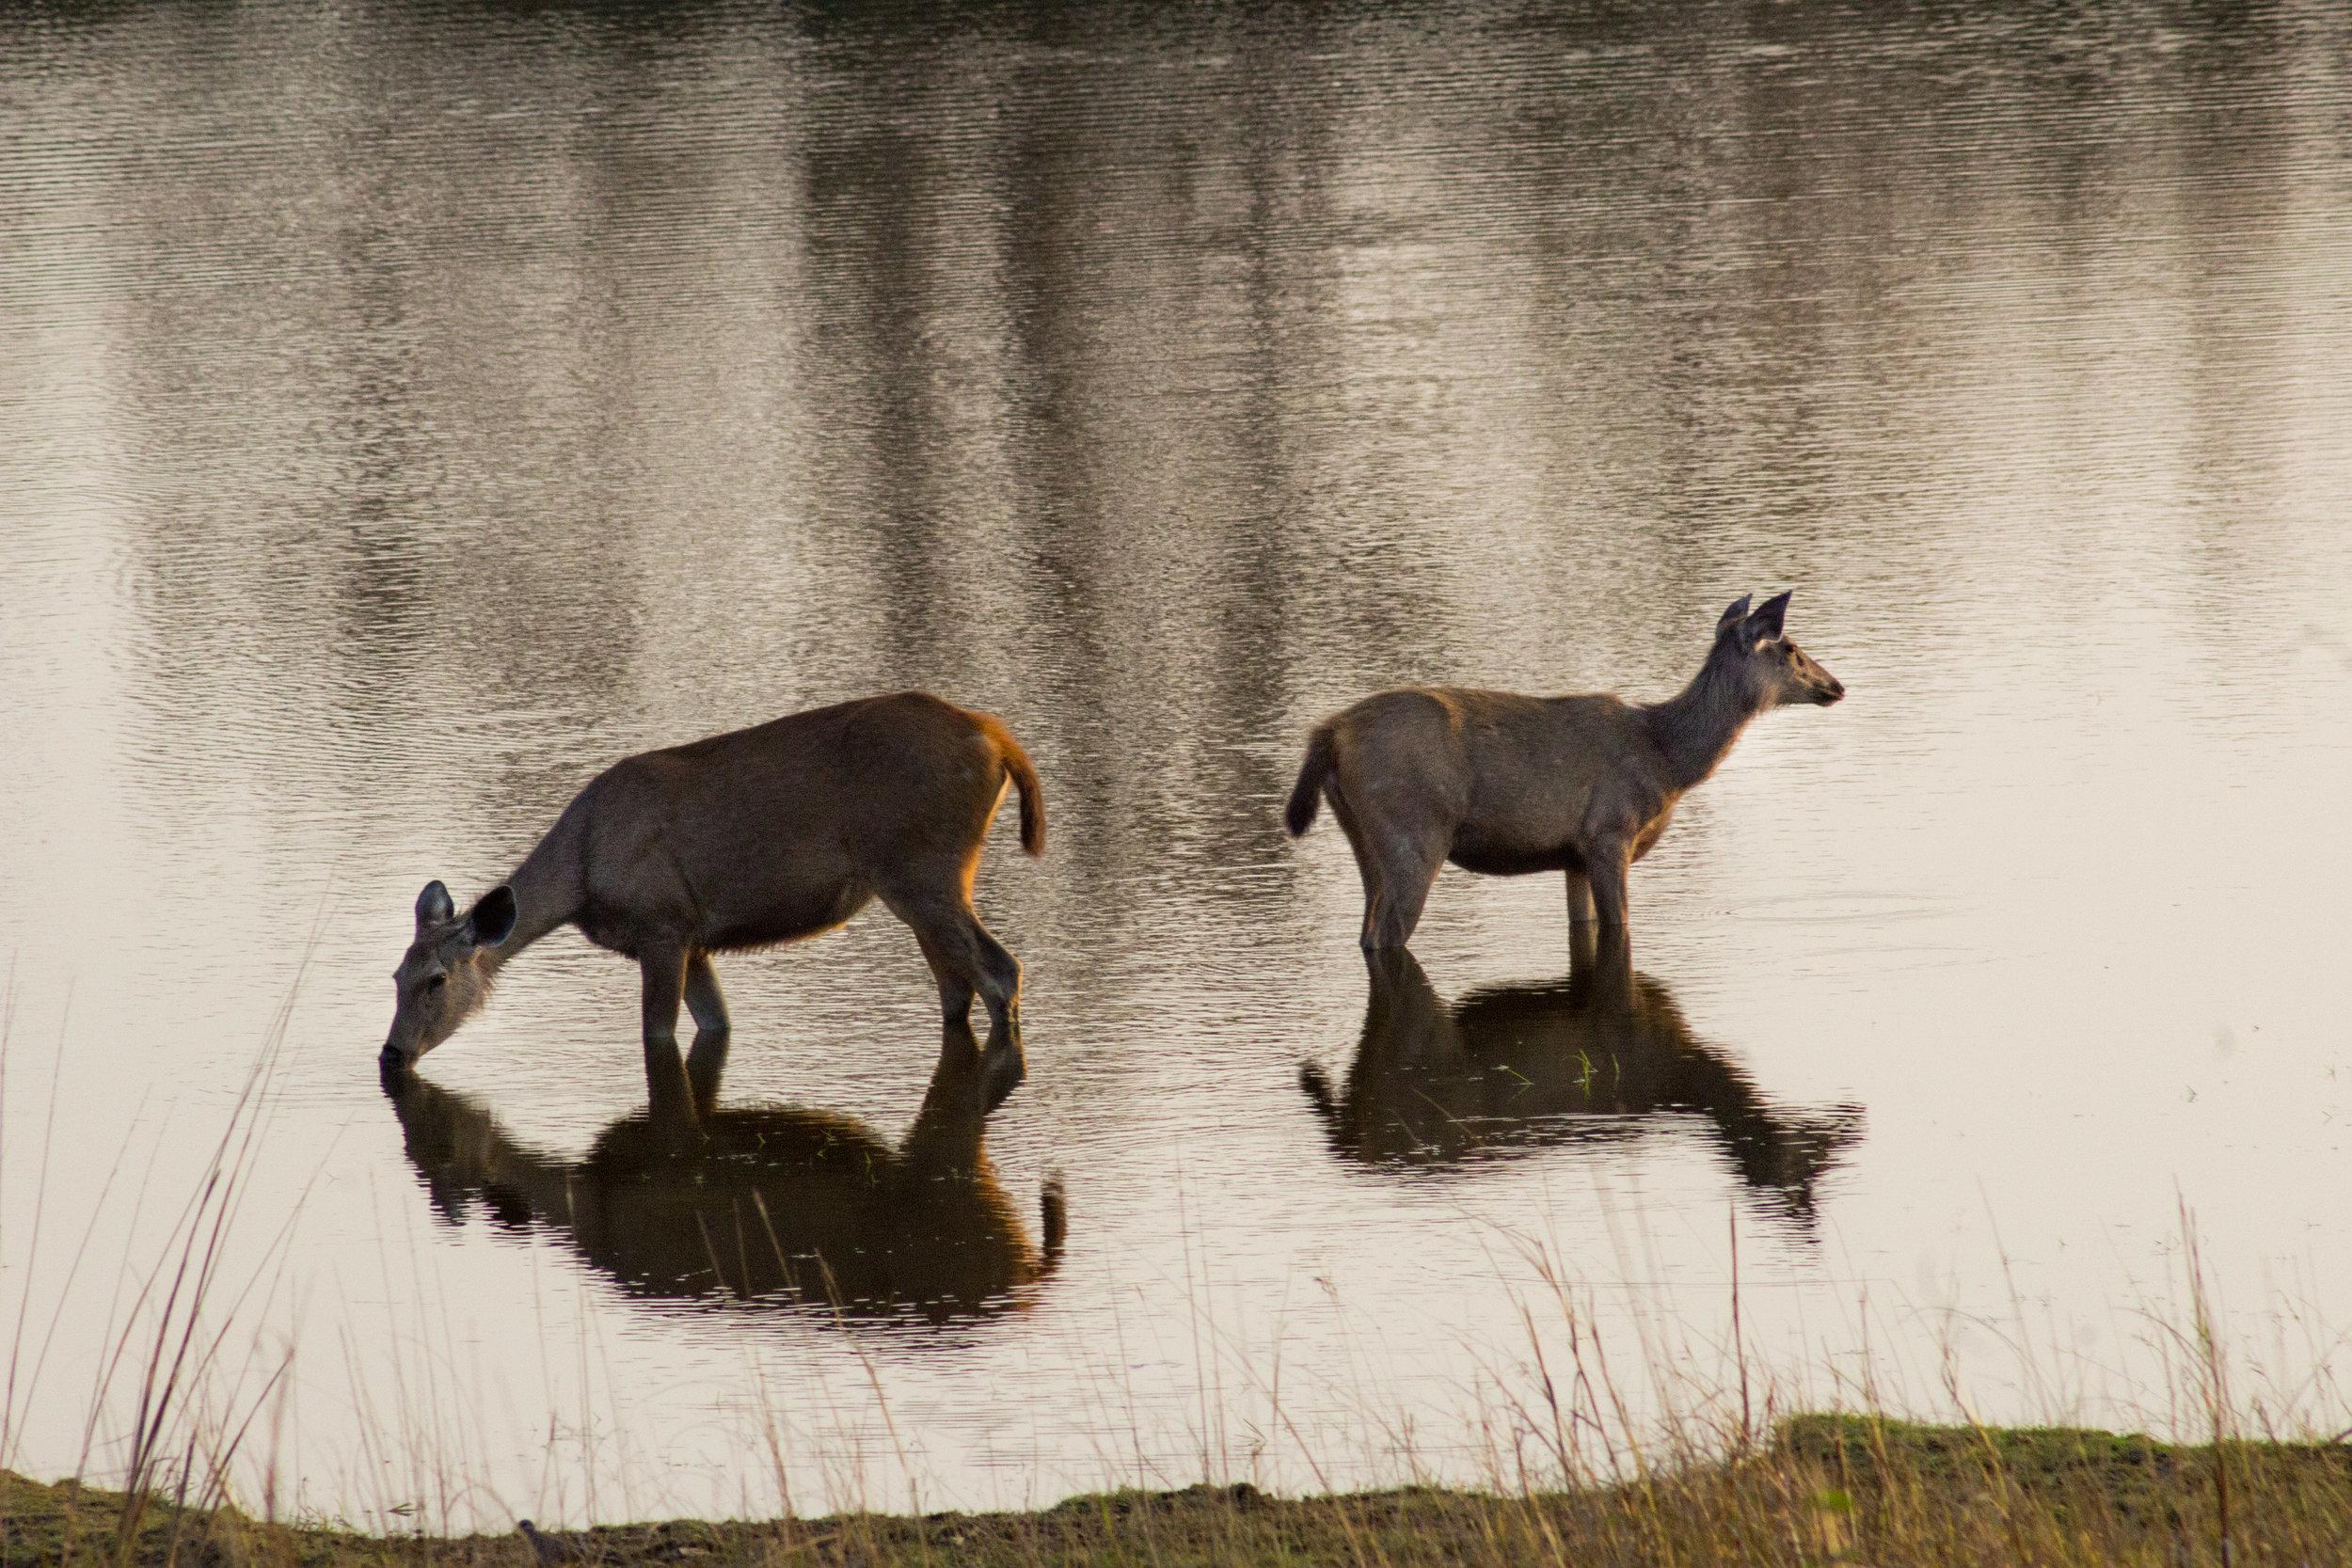 Two deer in water sunset India (1 of 1).jpg